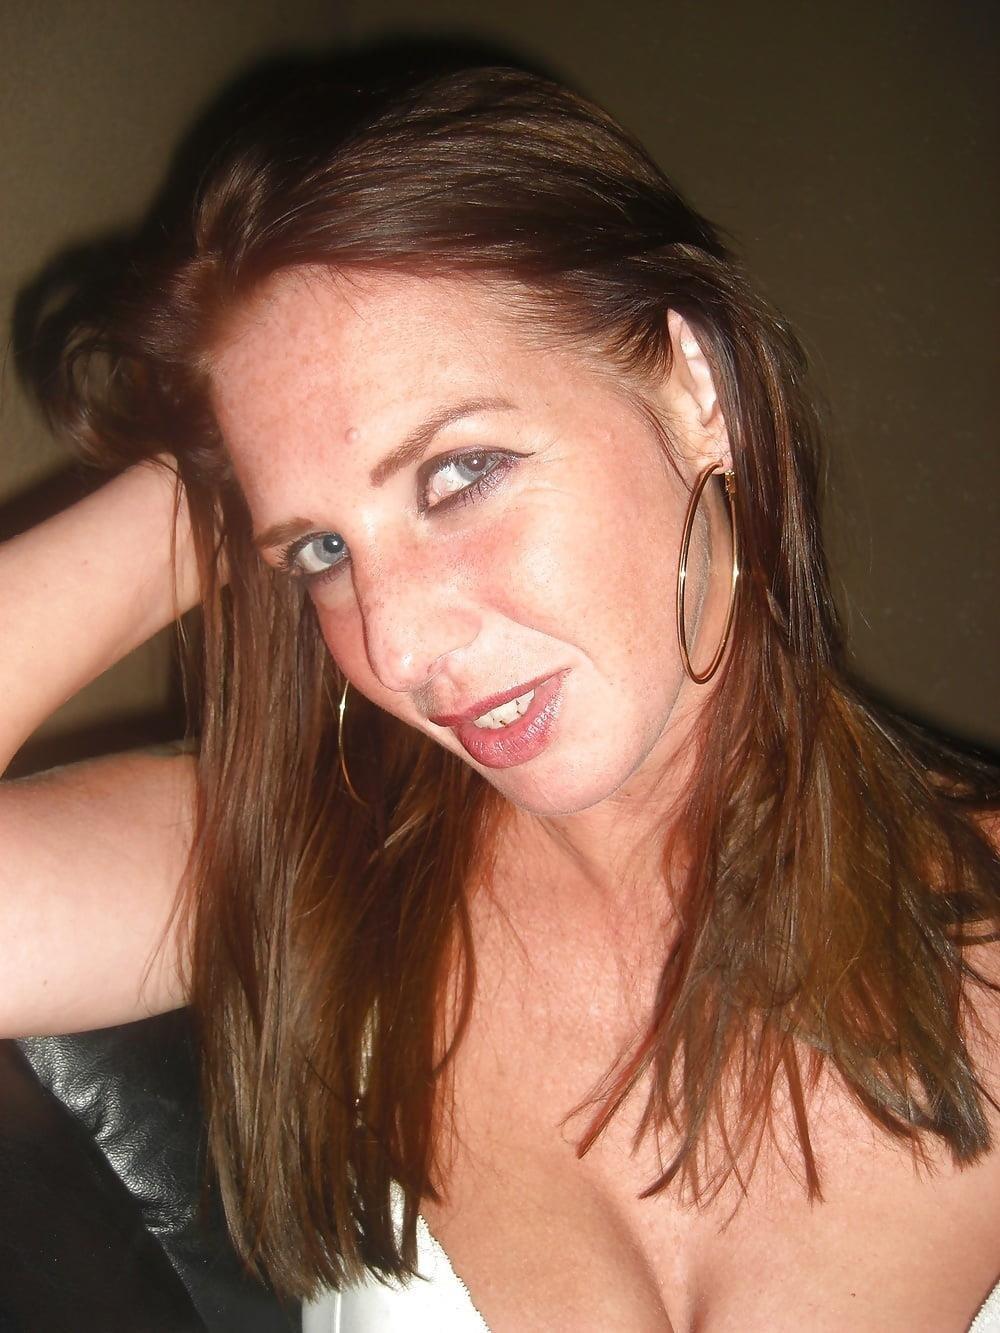 Big tit brunette pics-6990